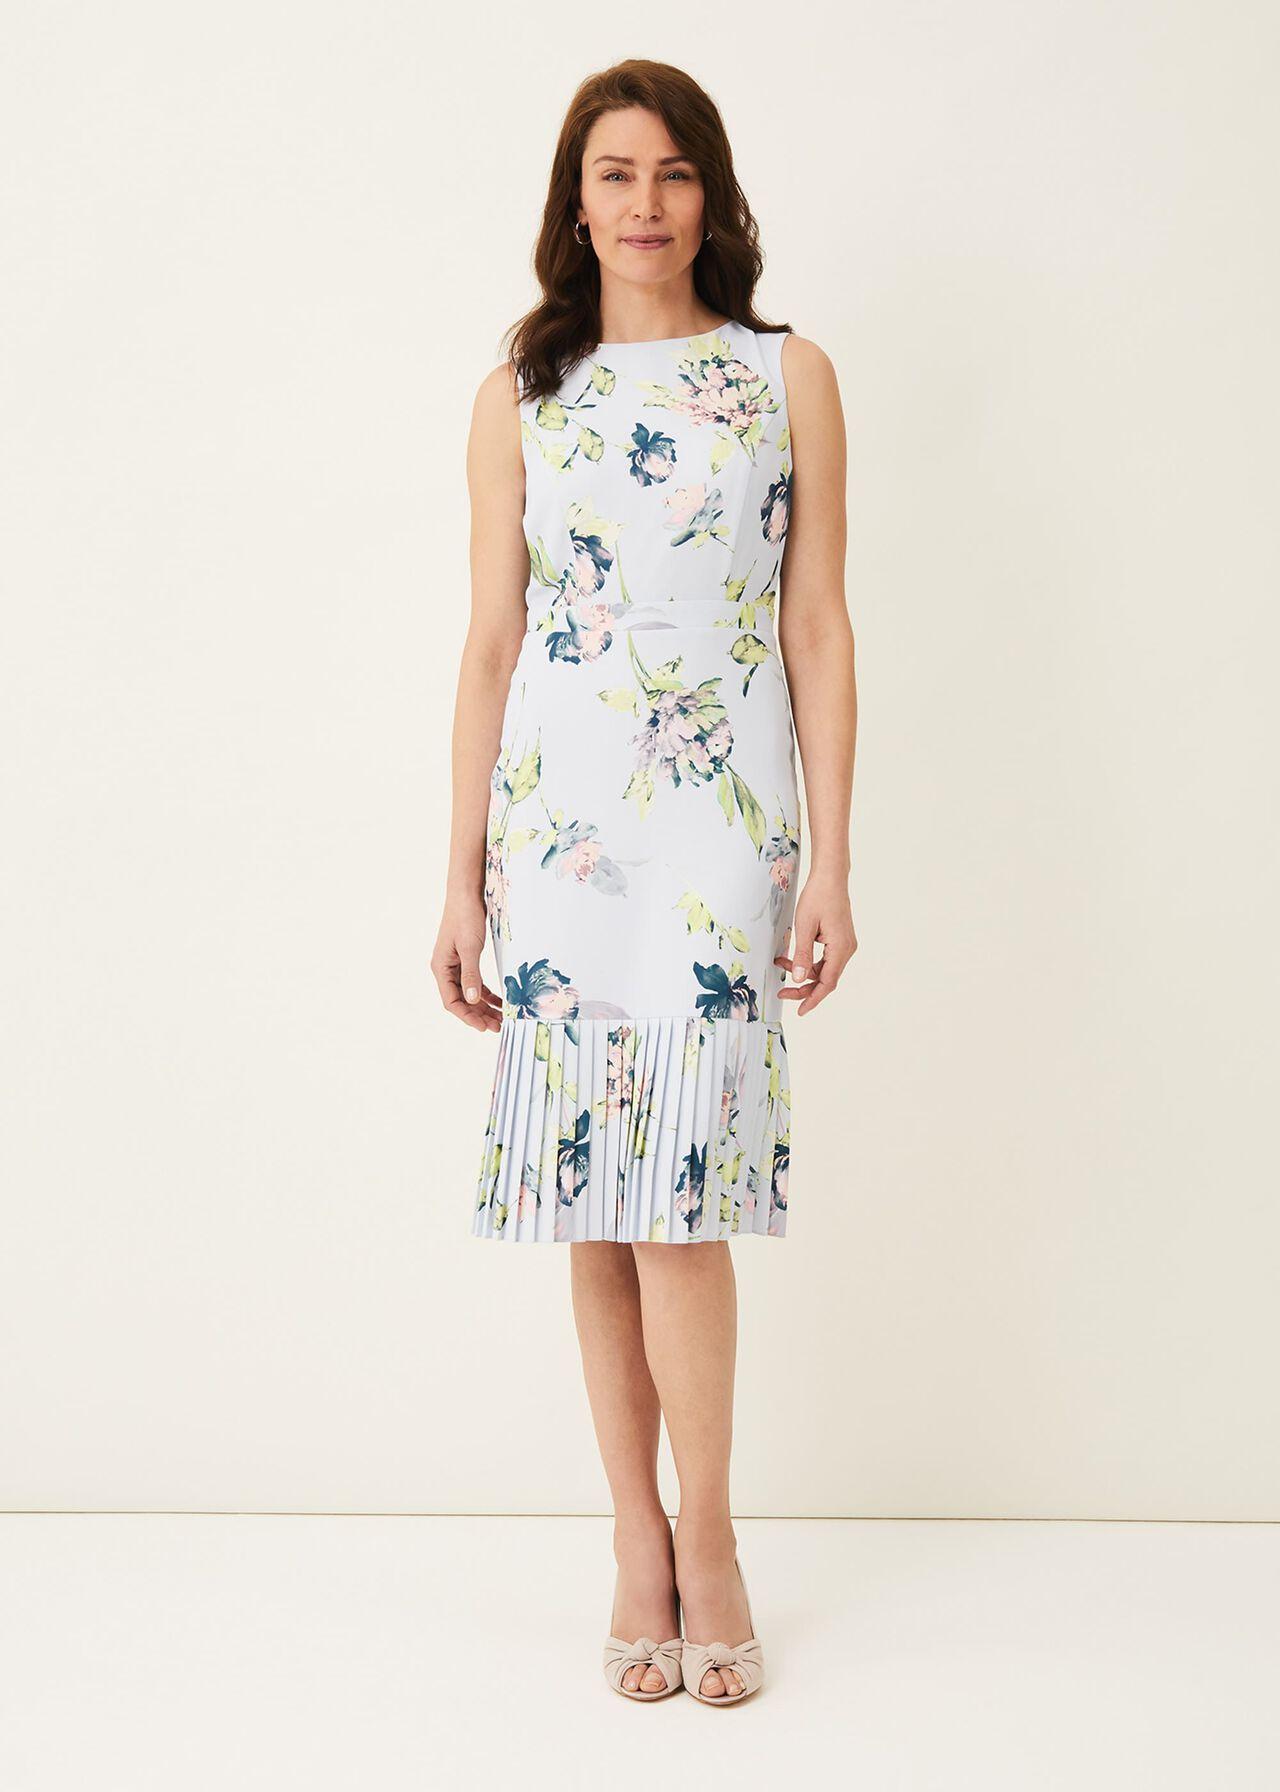 Farah Floral Dress